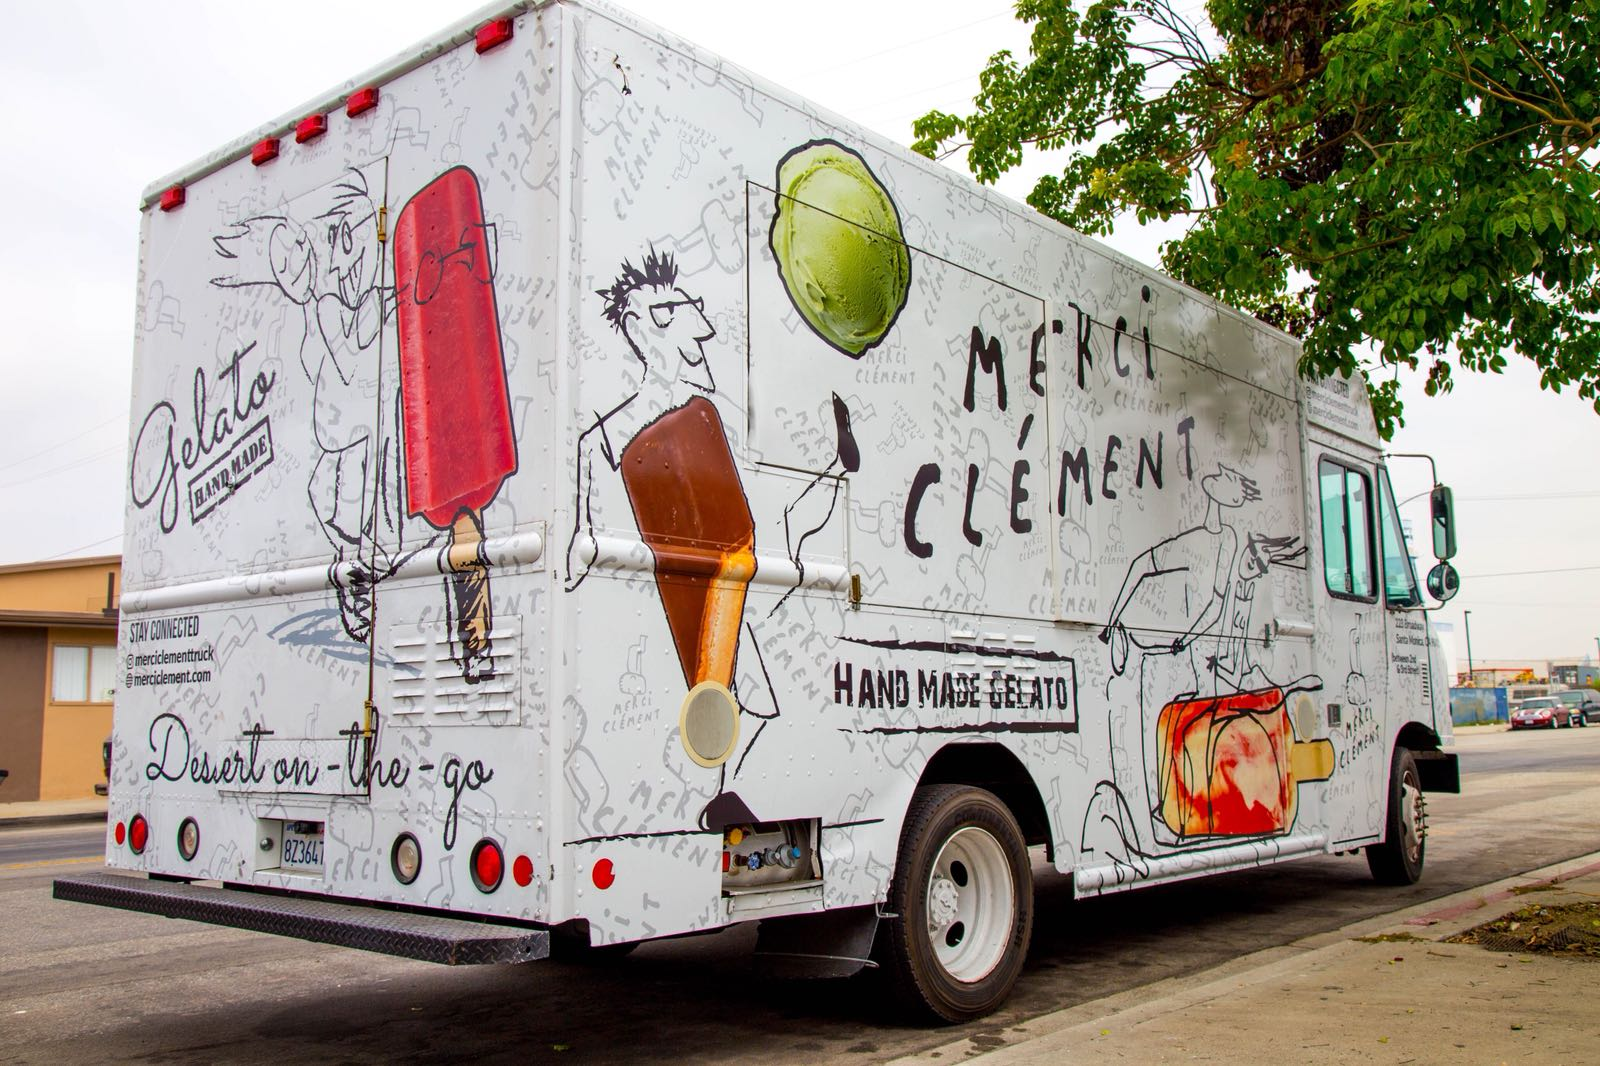 Merci Clement Truck